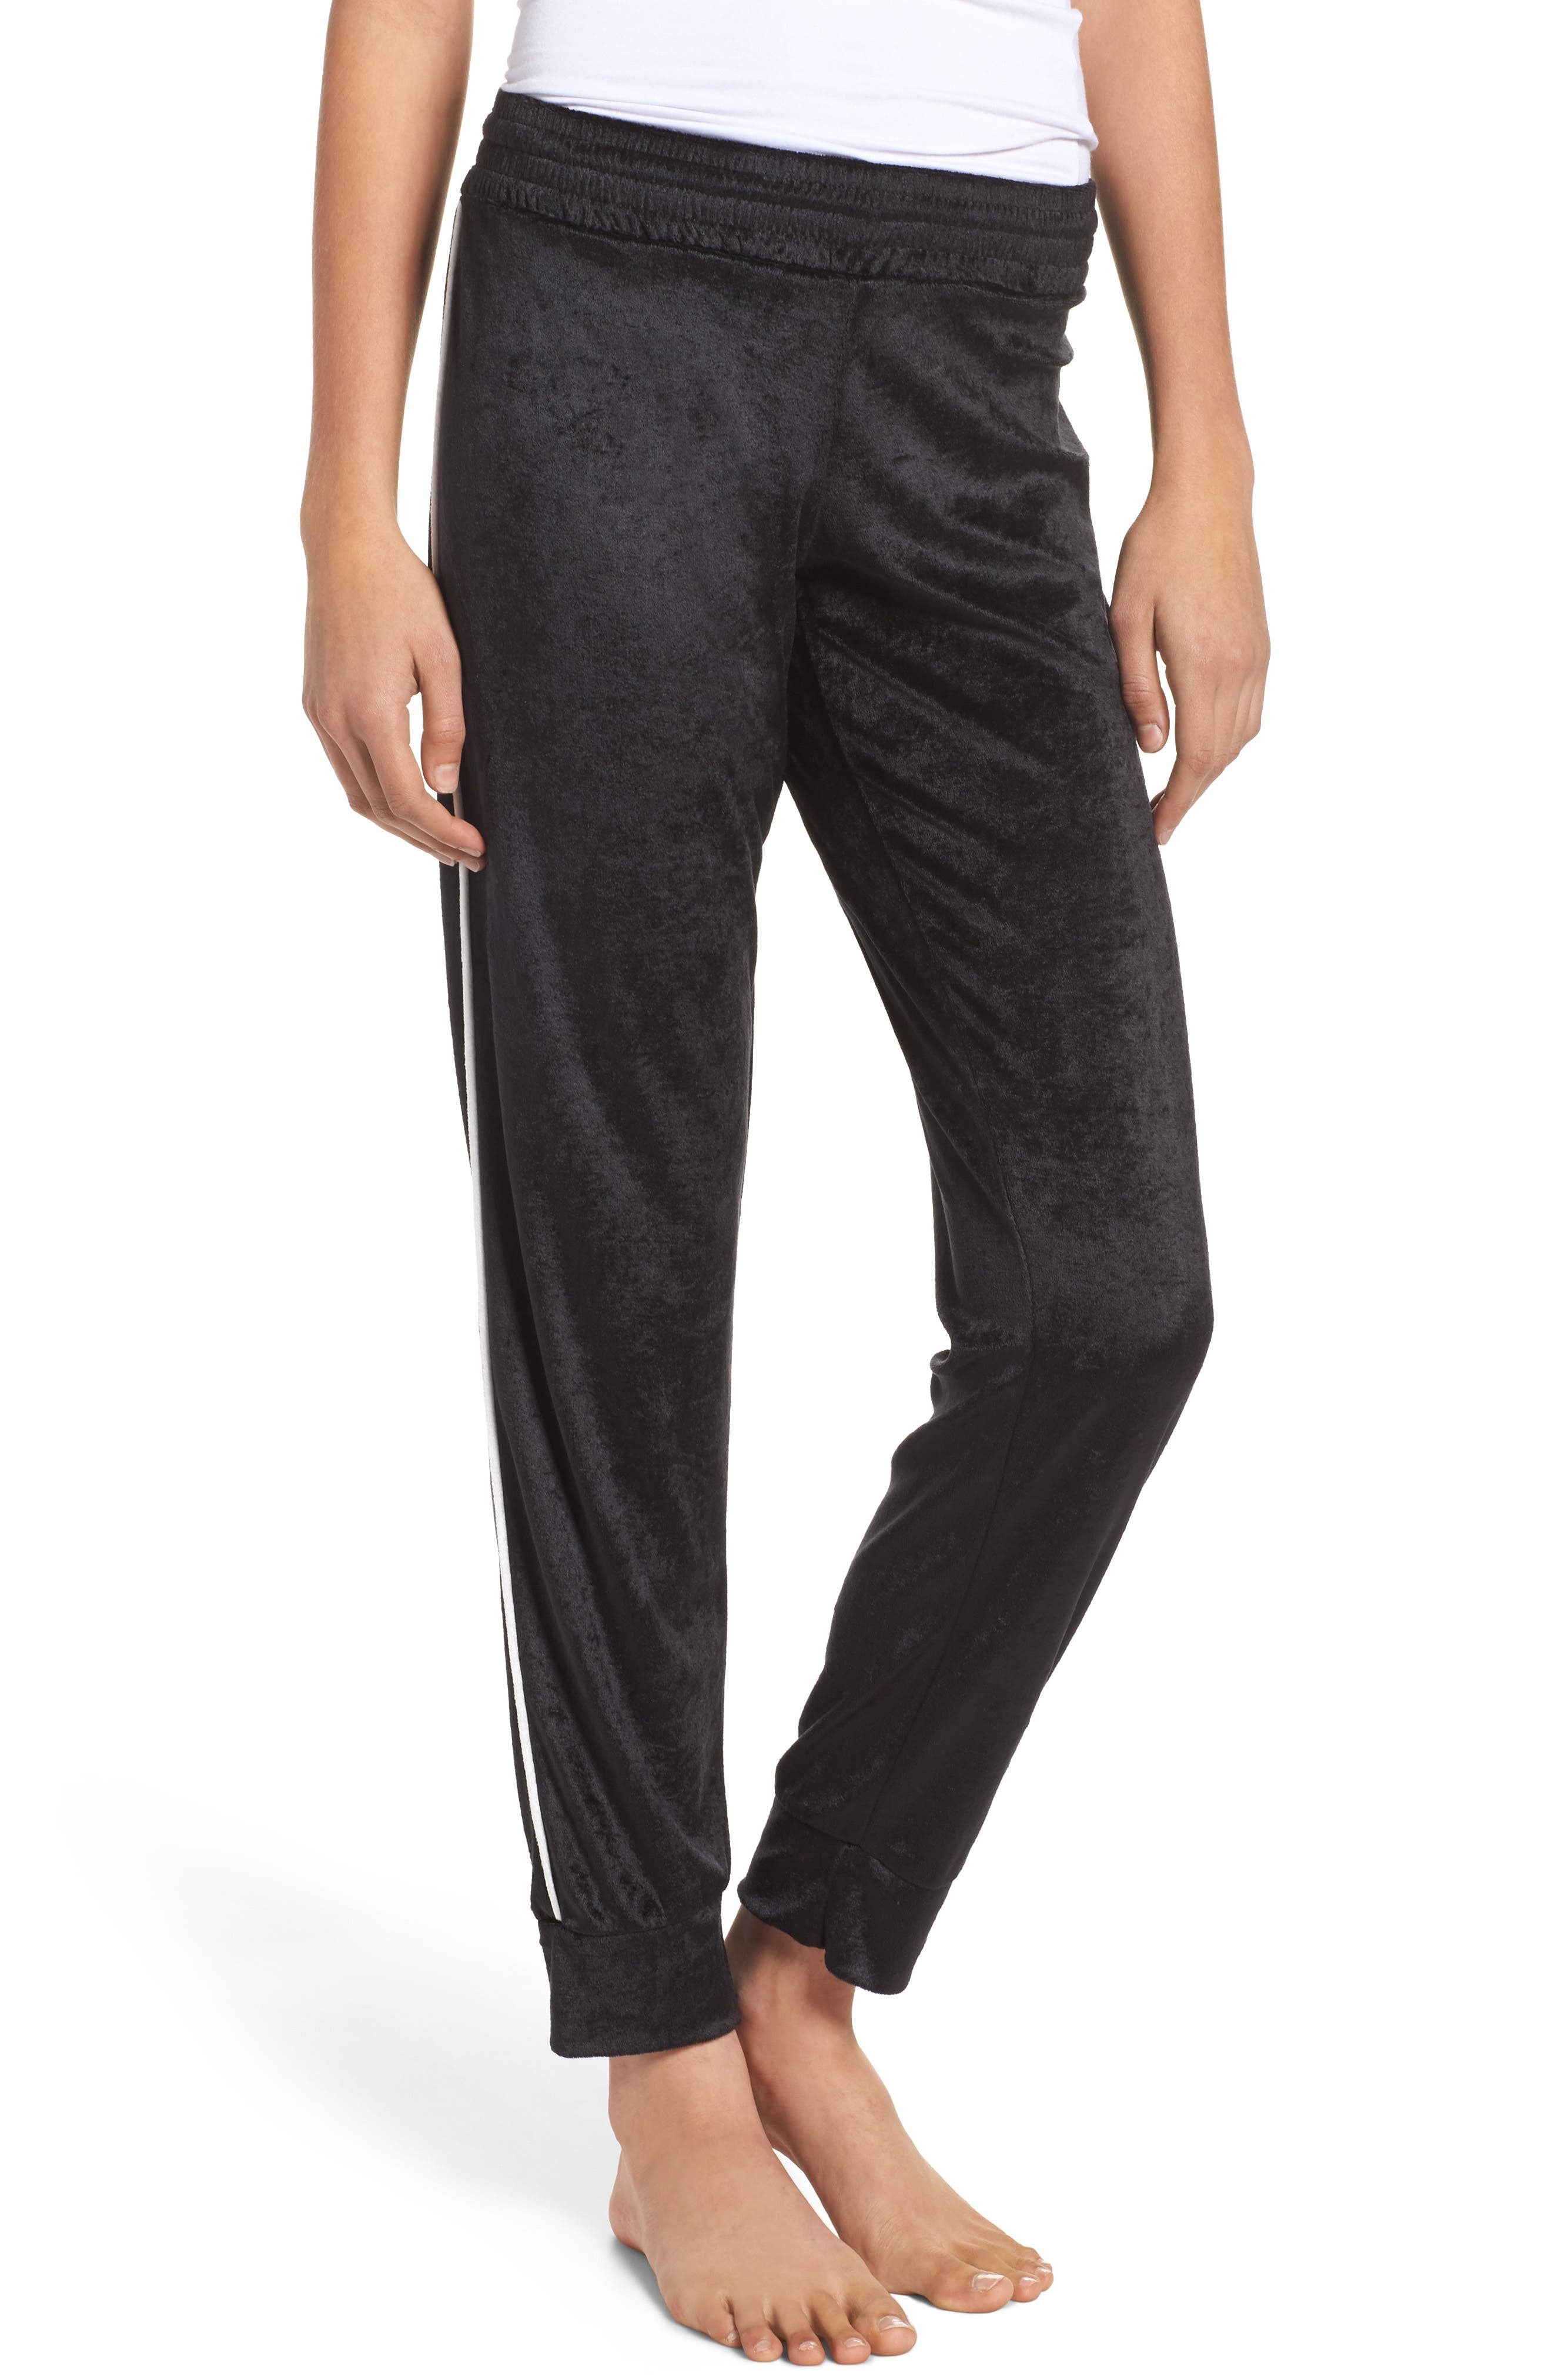 Alternate Image 1 Selected - Michael Lauren Galaxy Velour Lounge Track Pants